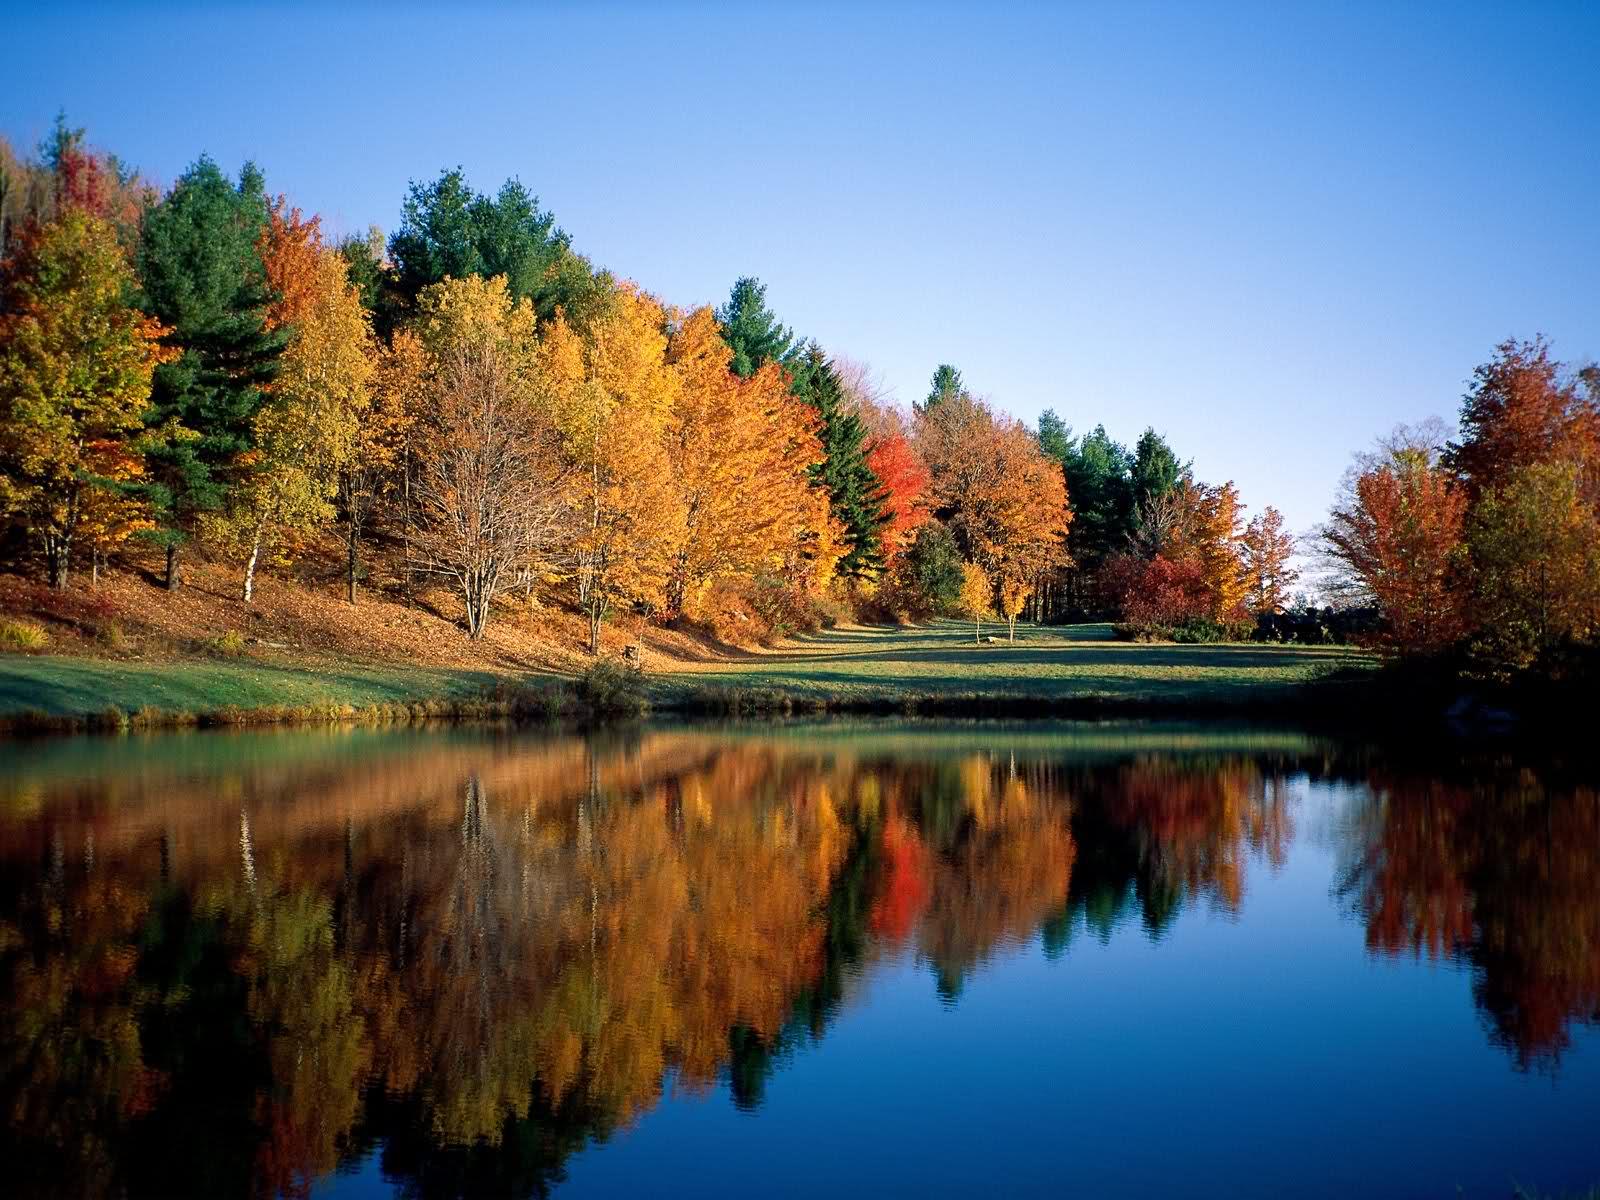 Jesen - fotografije - Page 4 Jesen